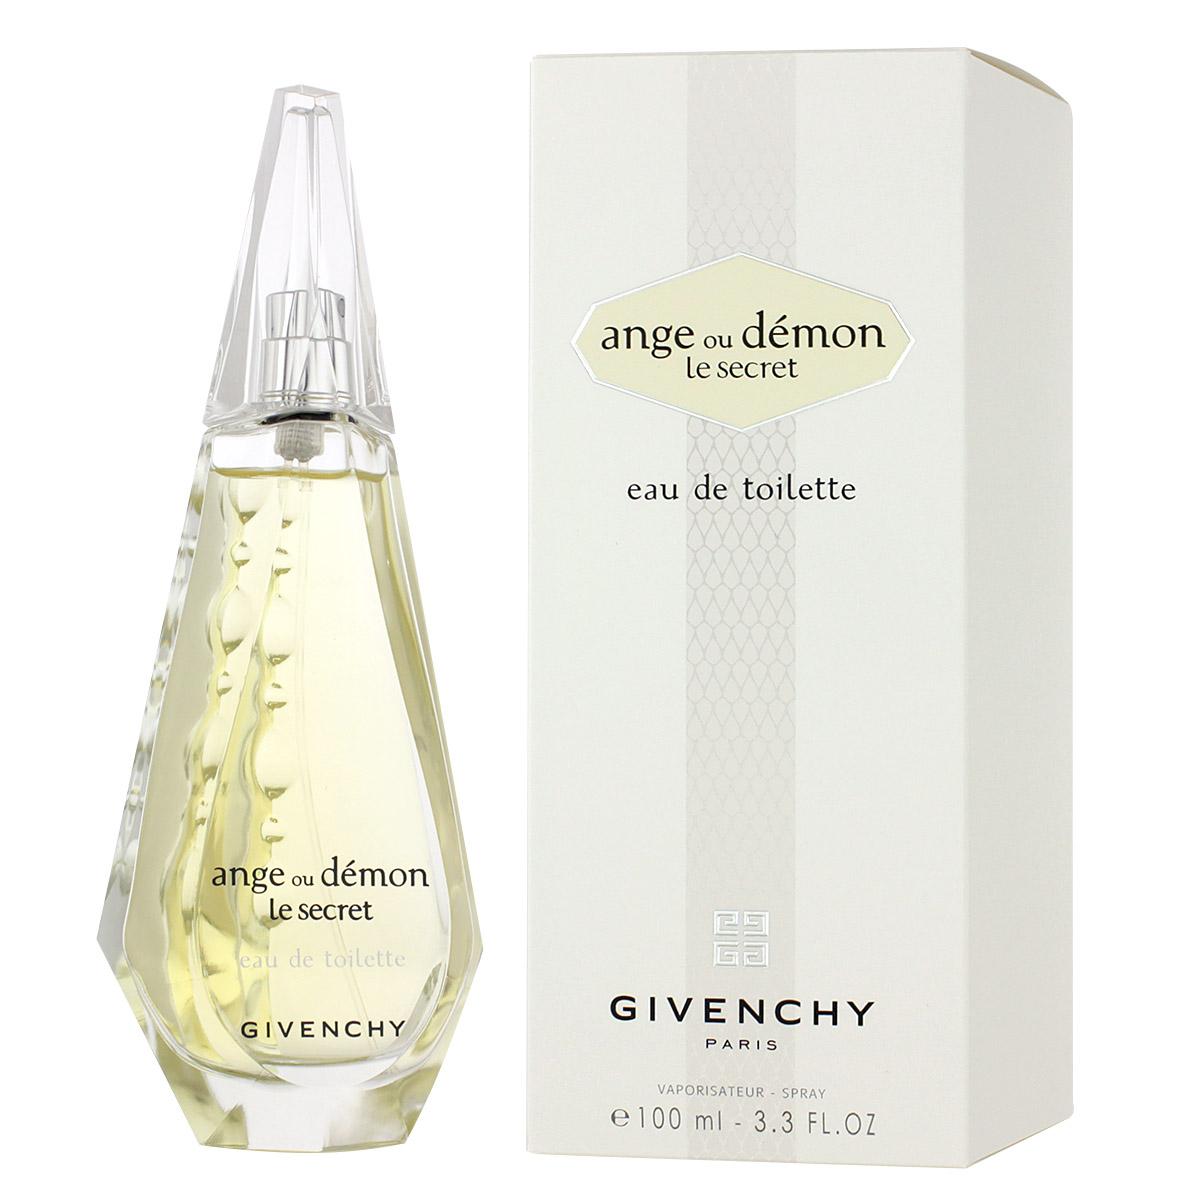 Givenchy Ange Ou Demon (Ange Ou Etrange) Le Secret EDT 100 ml